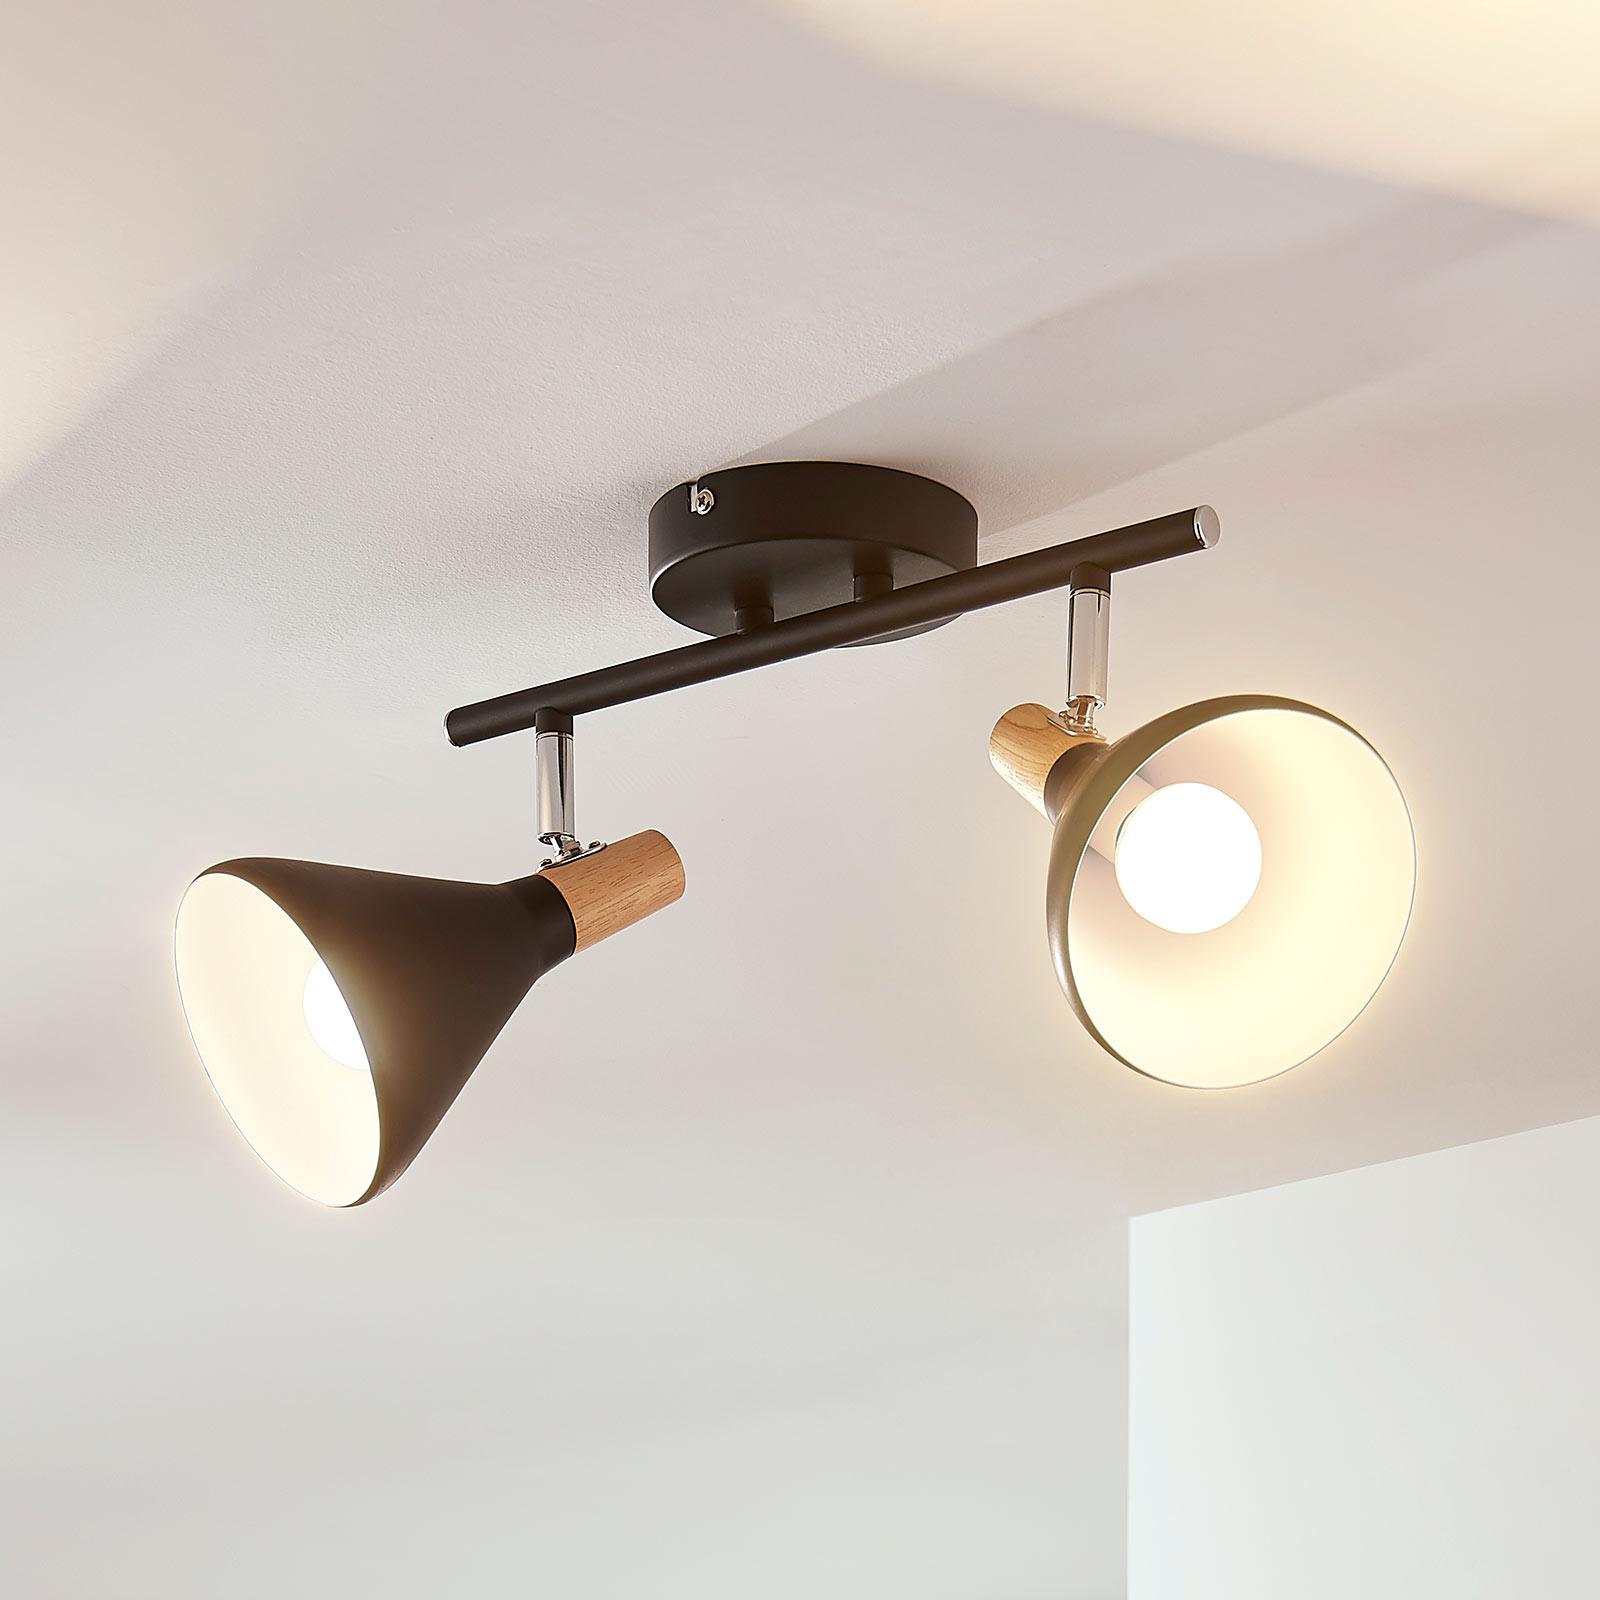 LED loftlampe Arina i sort med 2 lyskilder